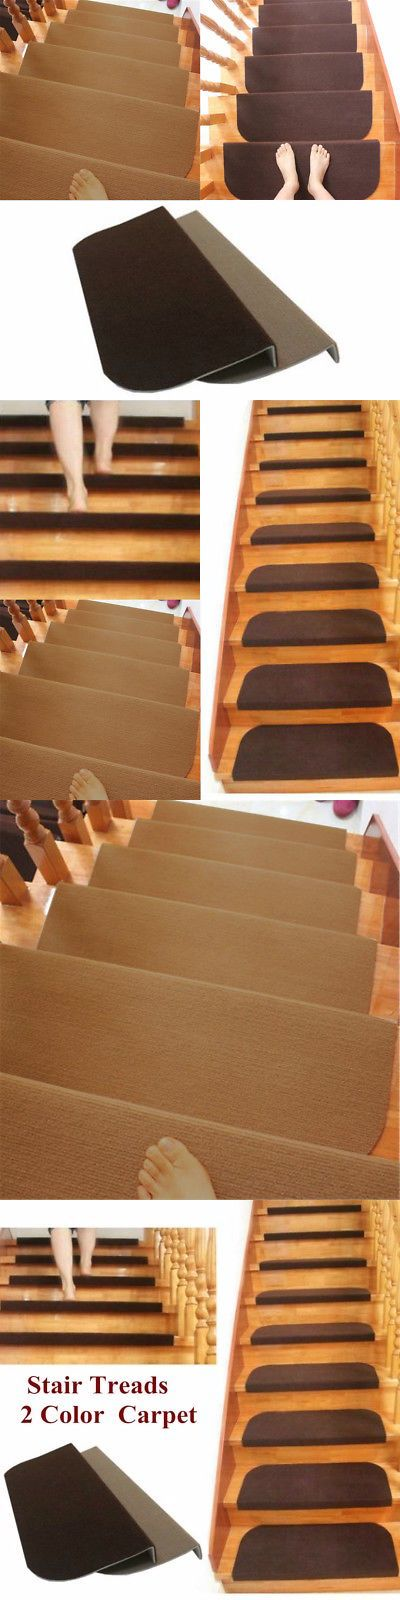 Best Stair Treads 175517 1 4 8Pcs Non Slip Adhesive Carpet 400 x 300